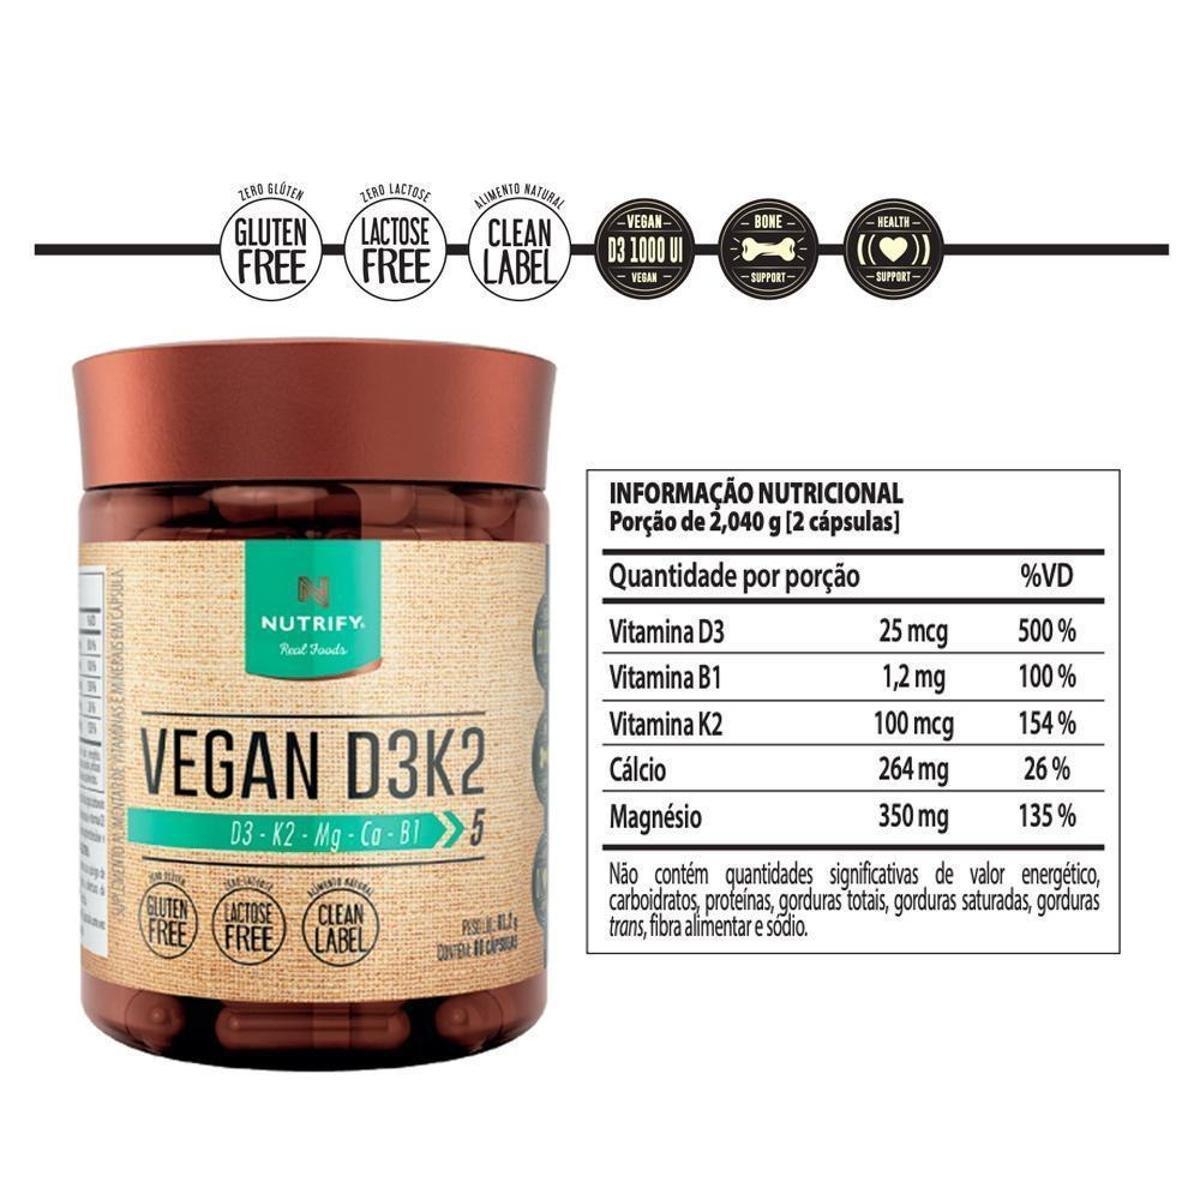 VEGAN D3K2 (60 CAPS) - NUTRIFY